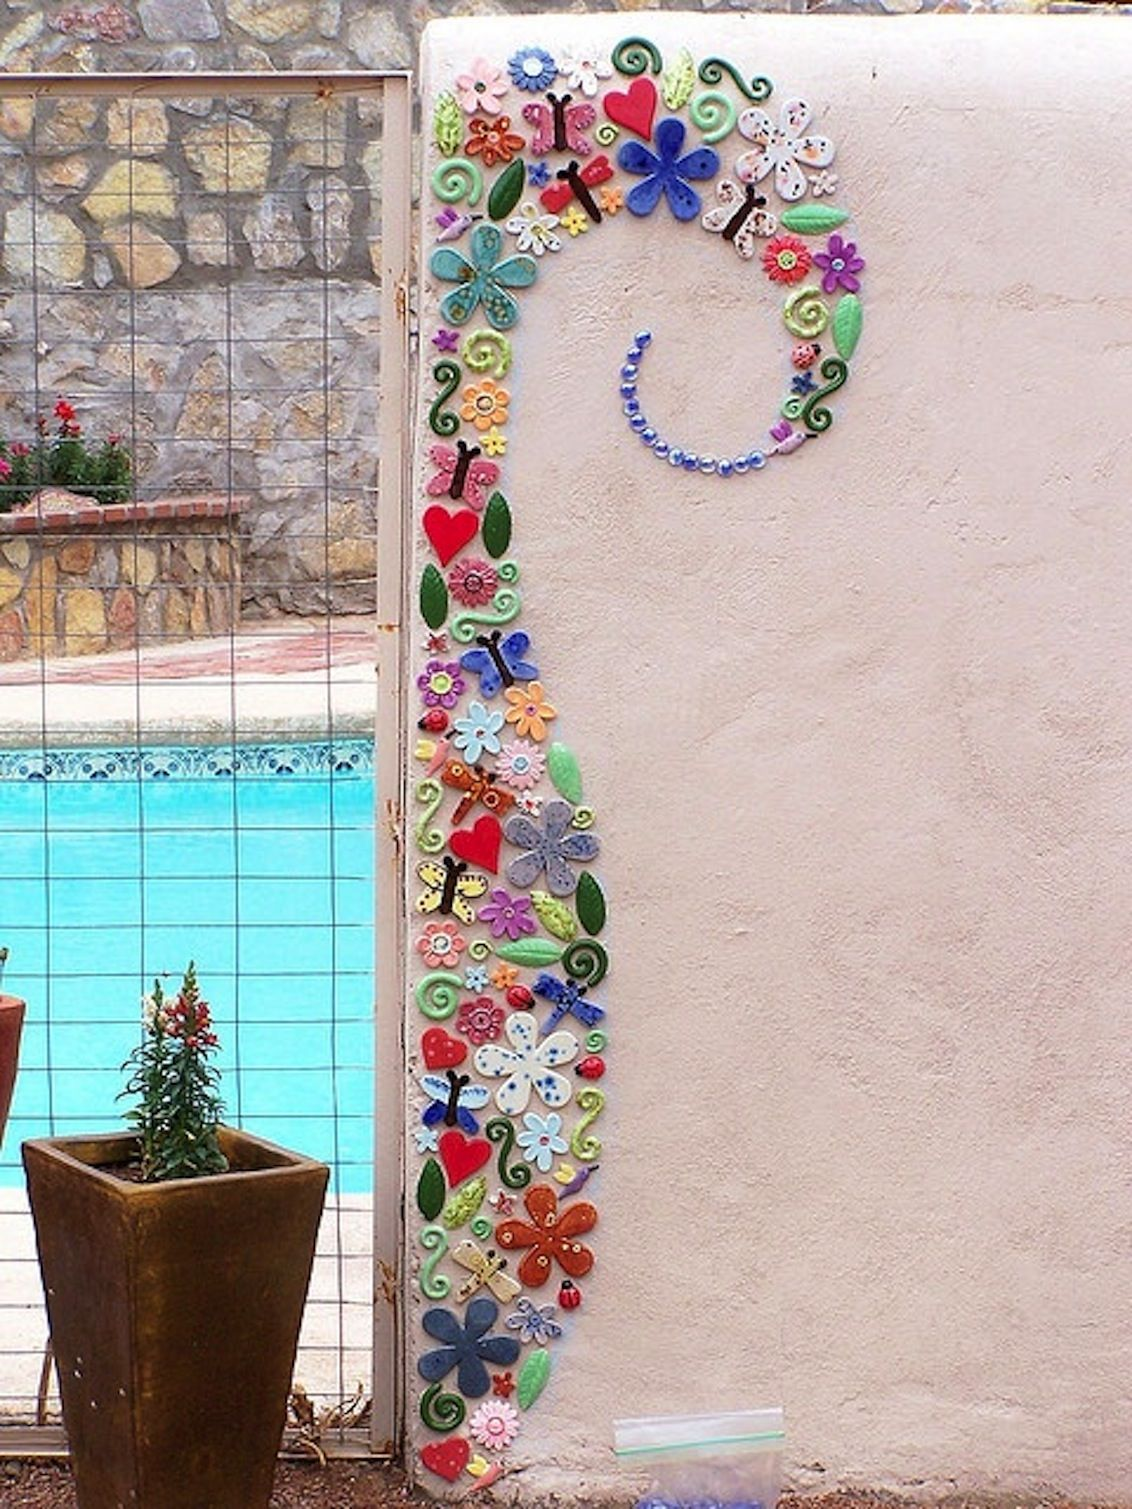 Decorative wall mosaicproject ideas pinterest decorative